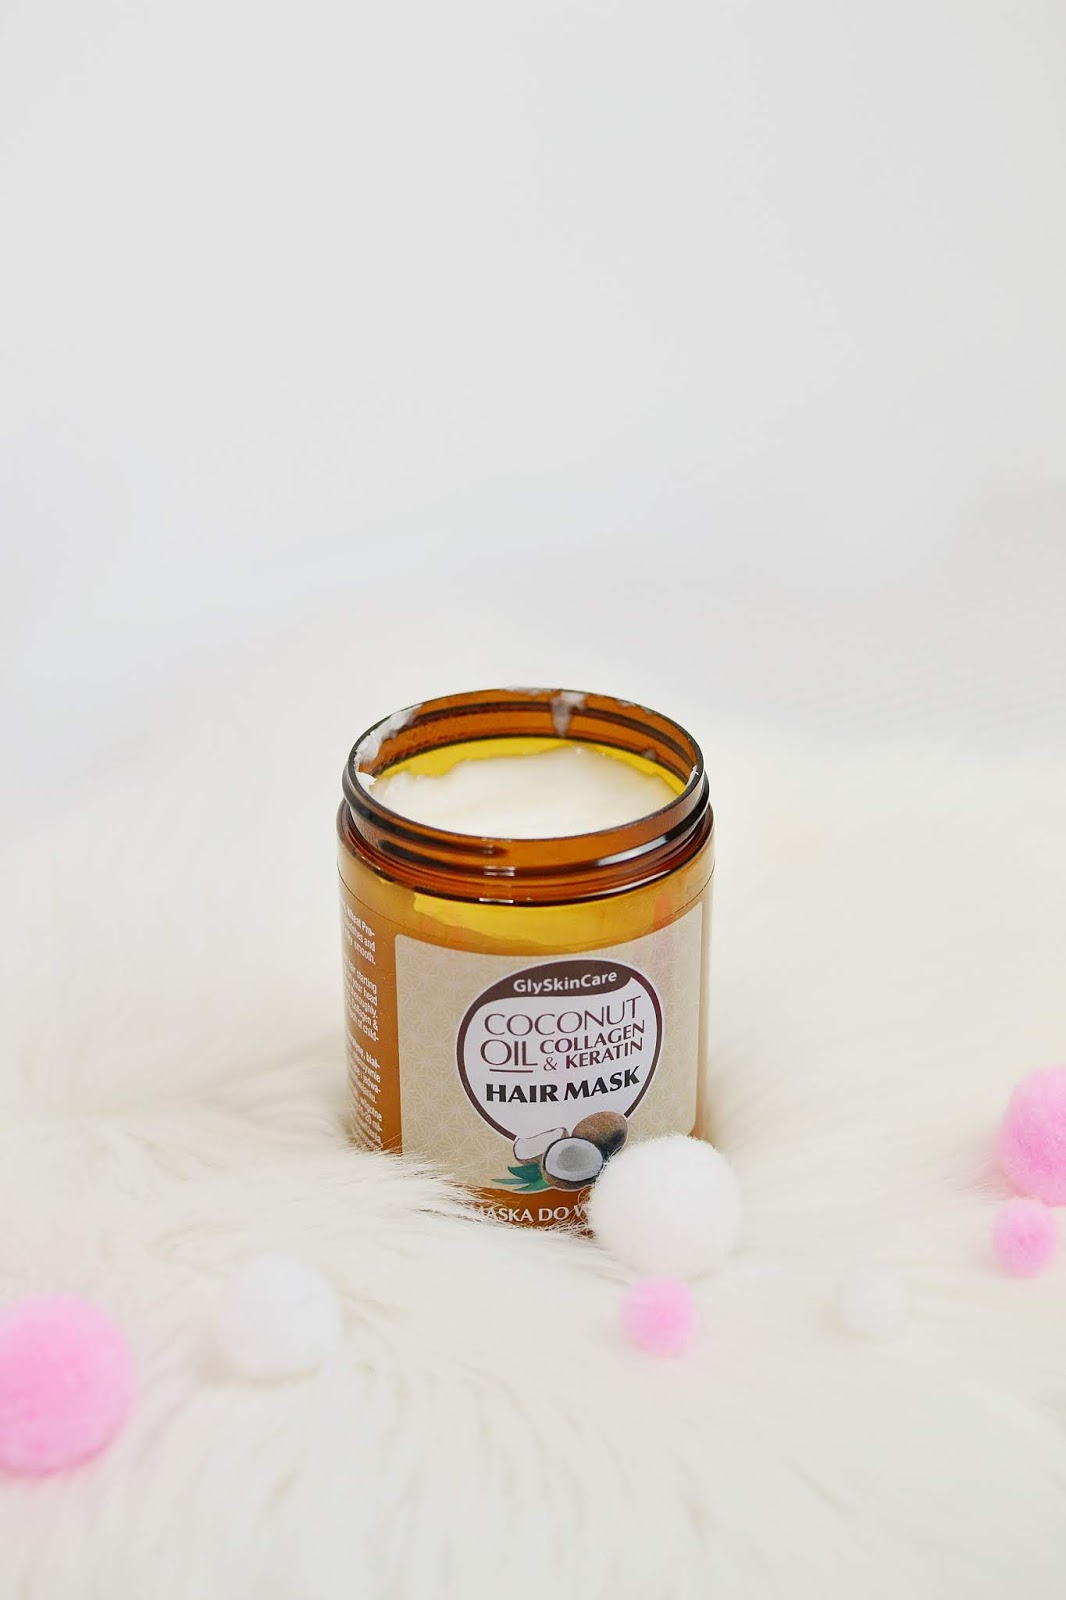 gly skin care coconut oil szampon odżywka maska